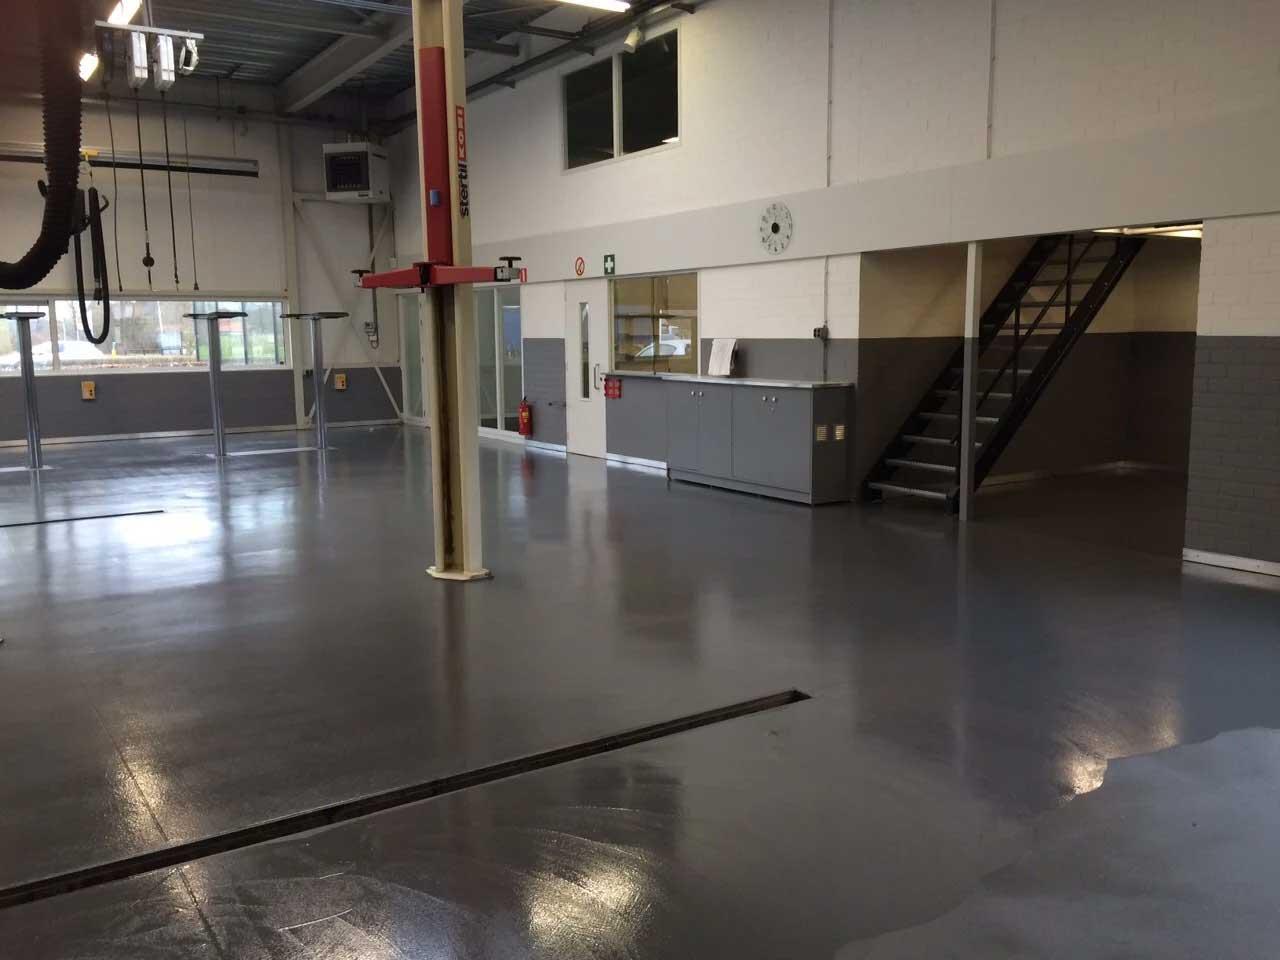 Coatingvloer garage